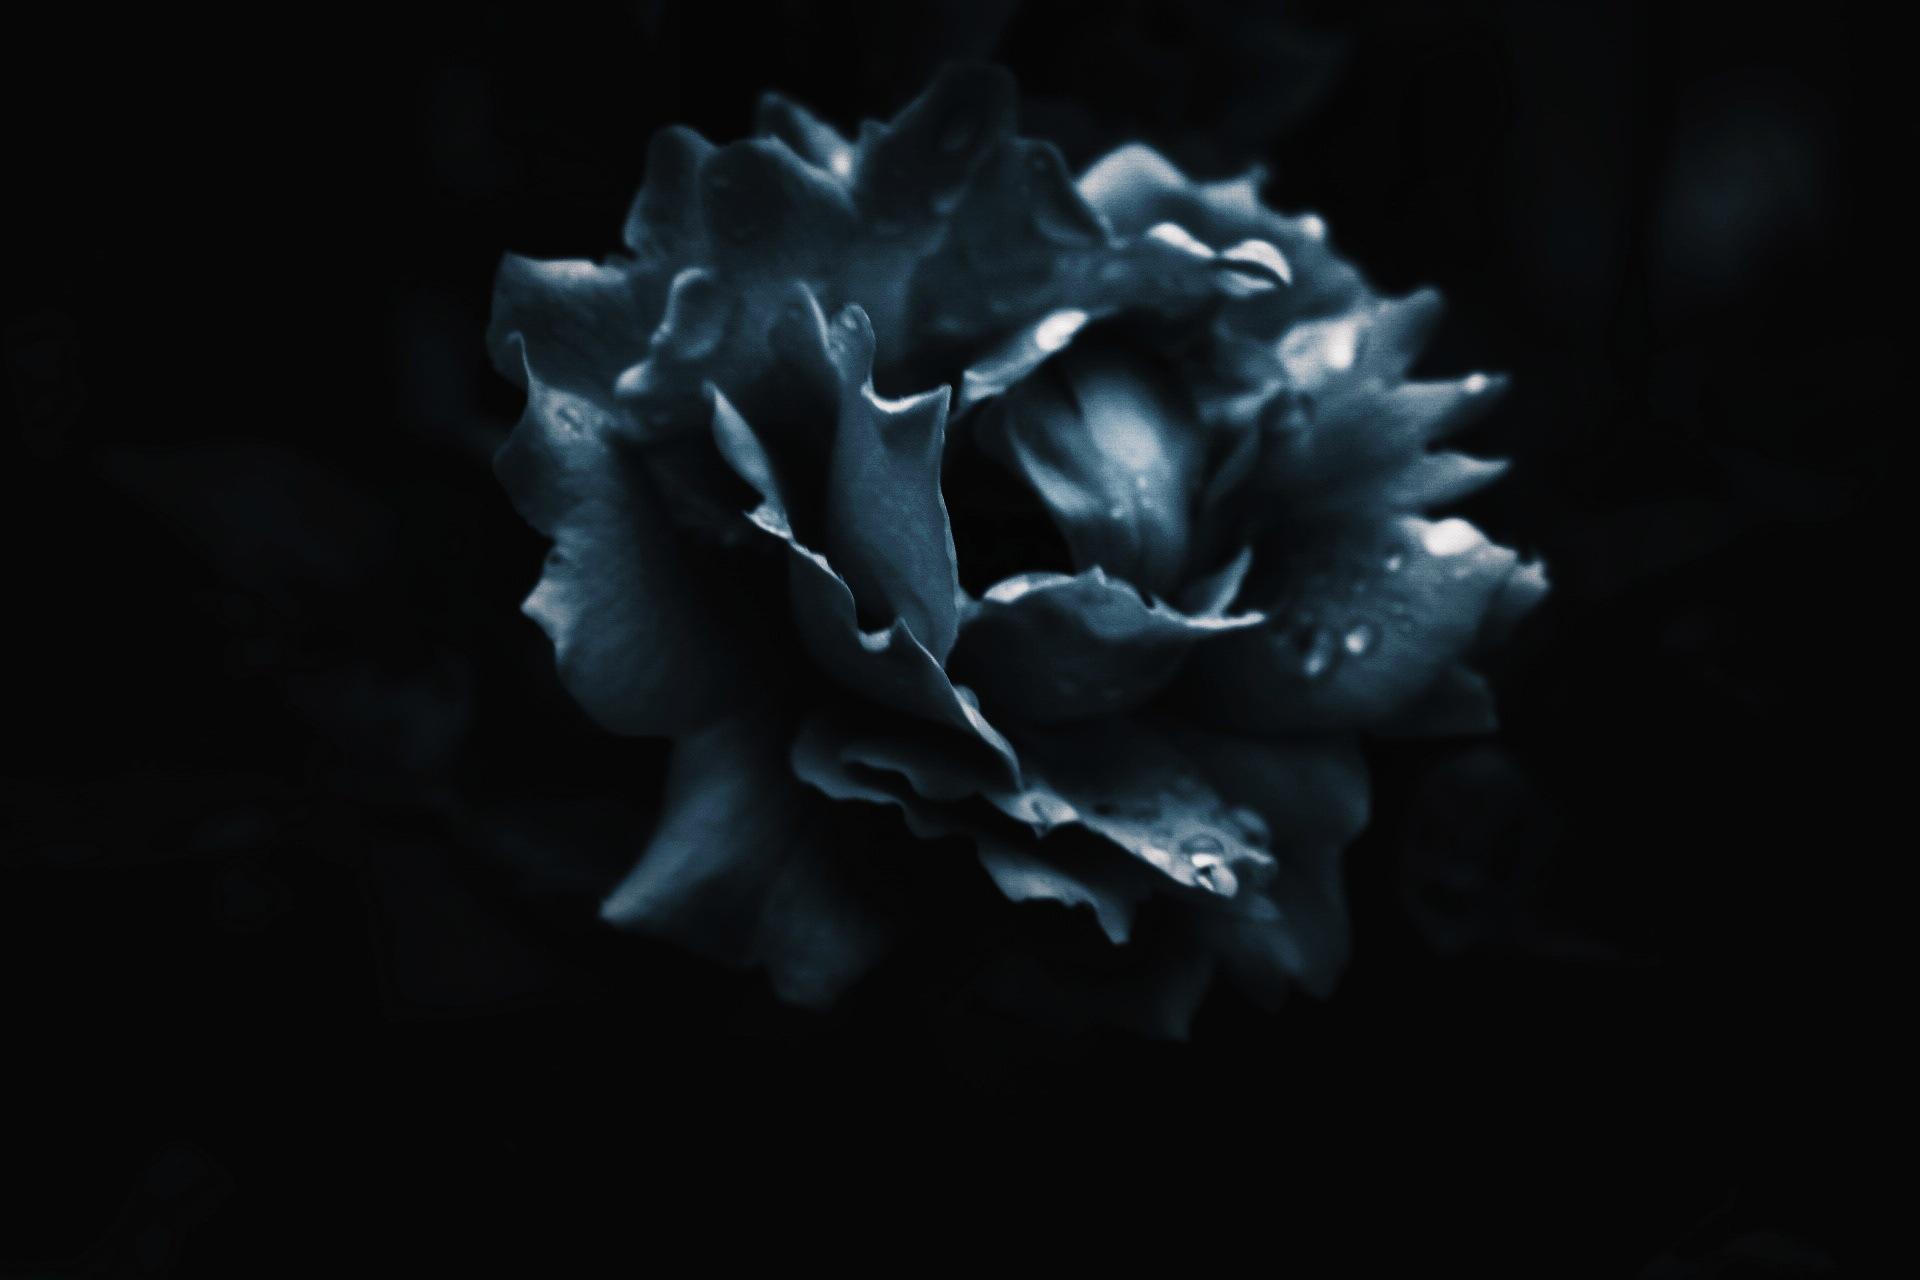 Blue by Maria Berggren